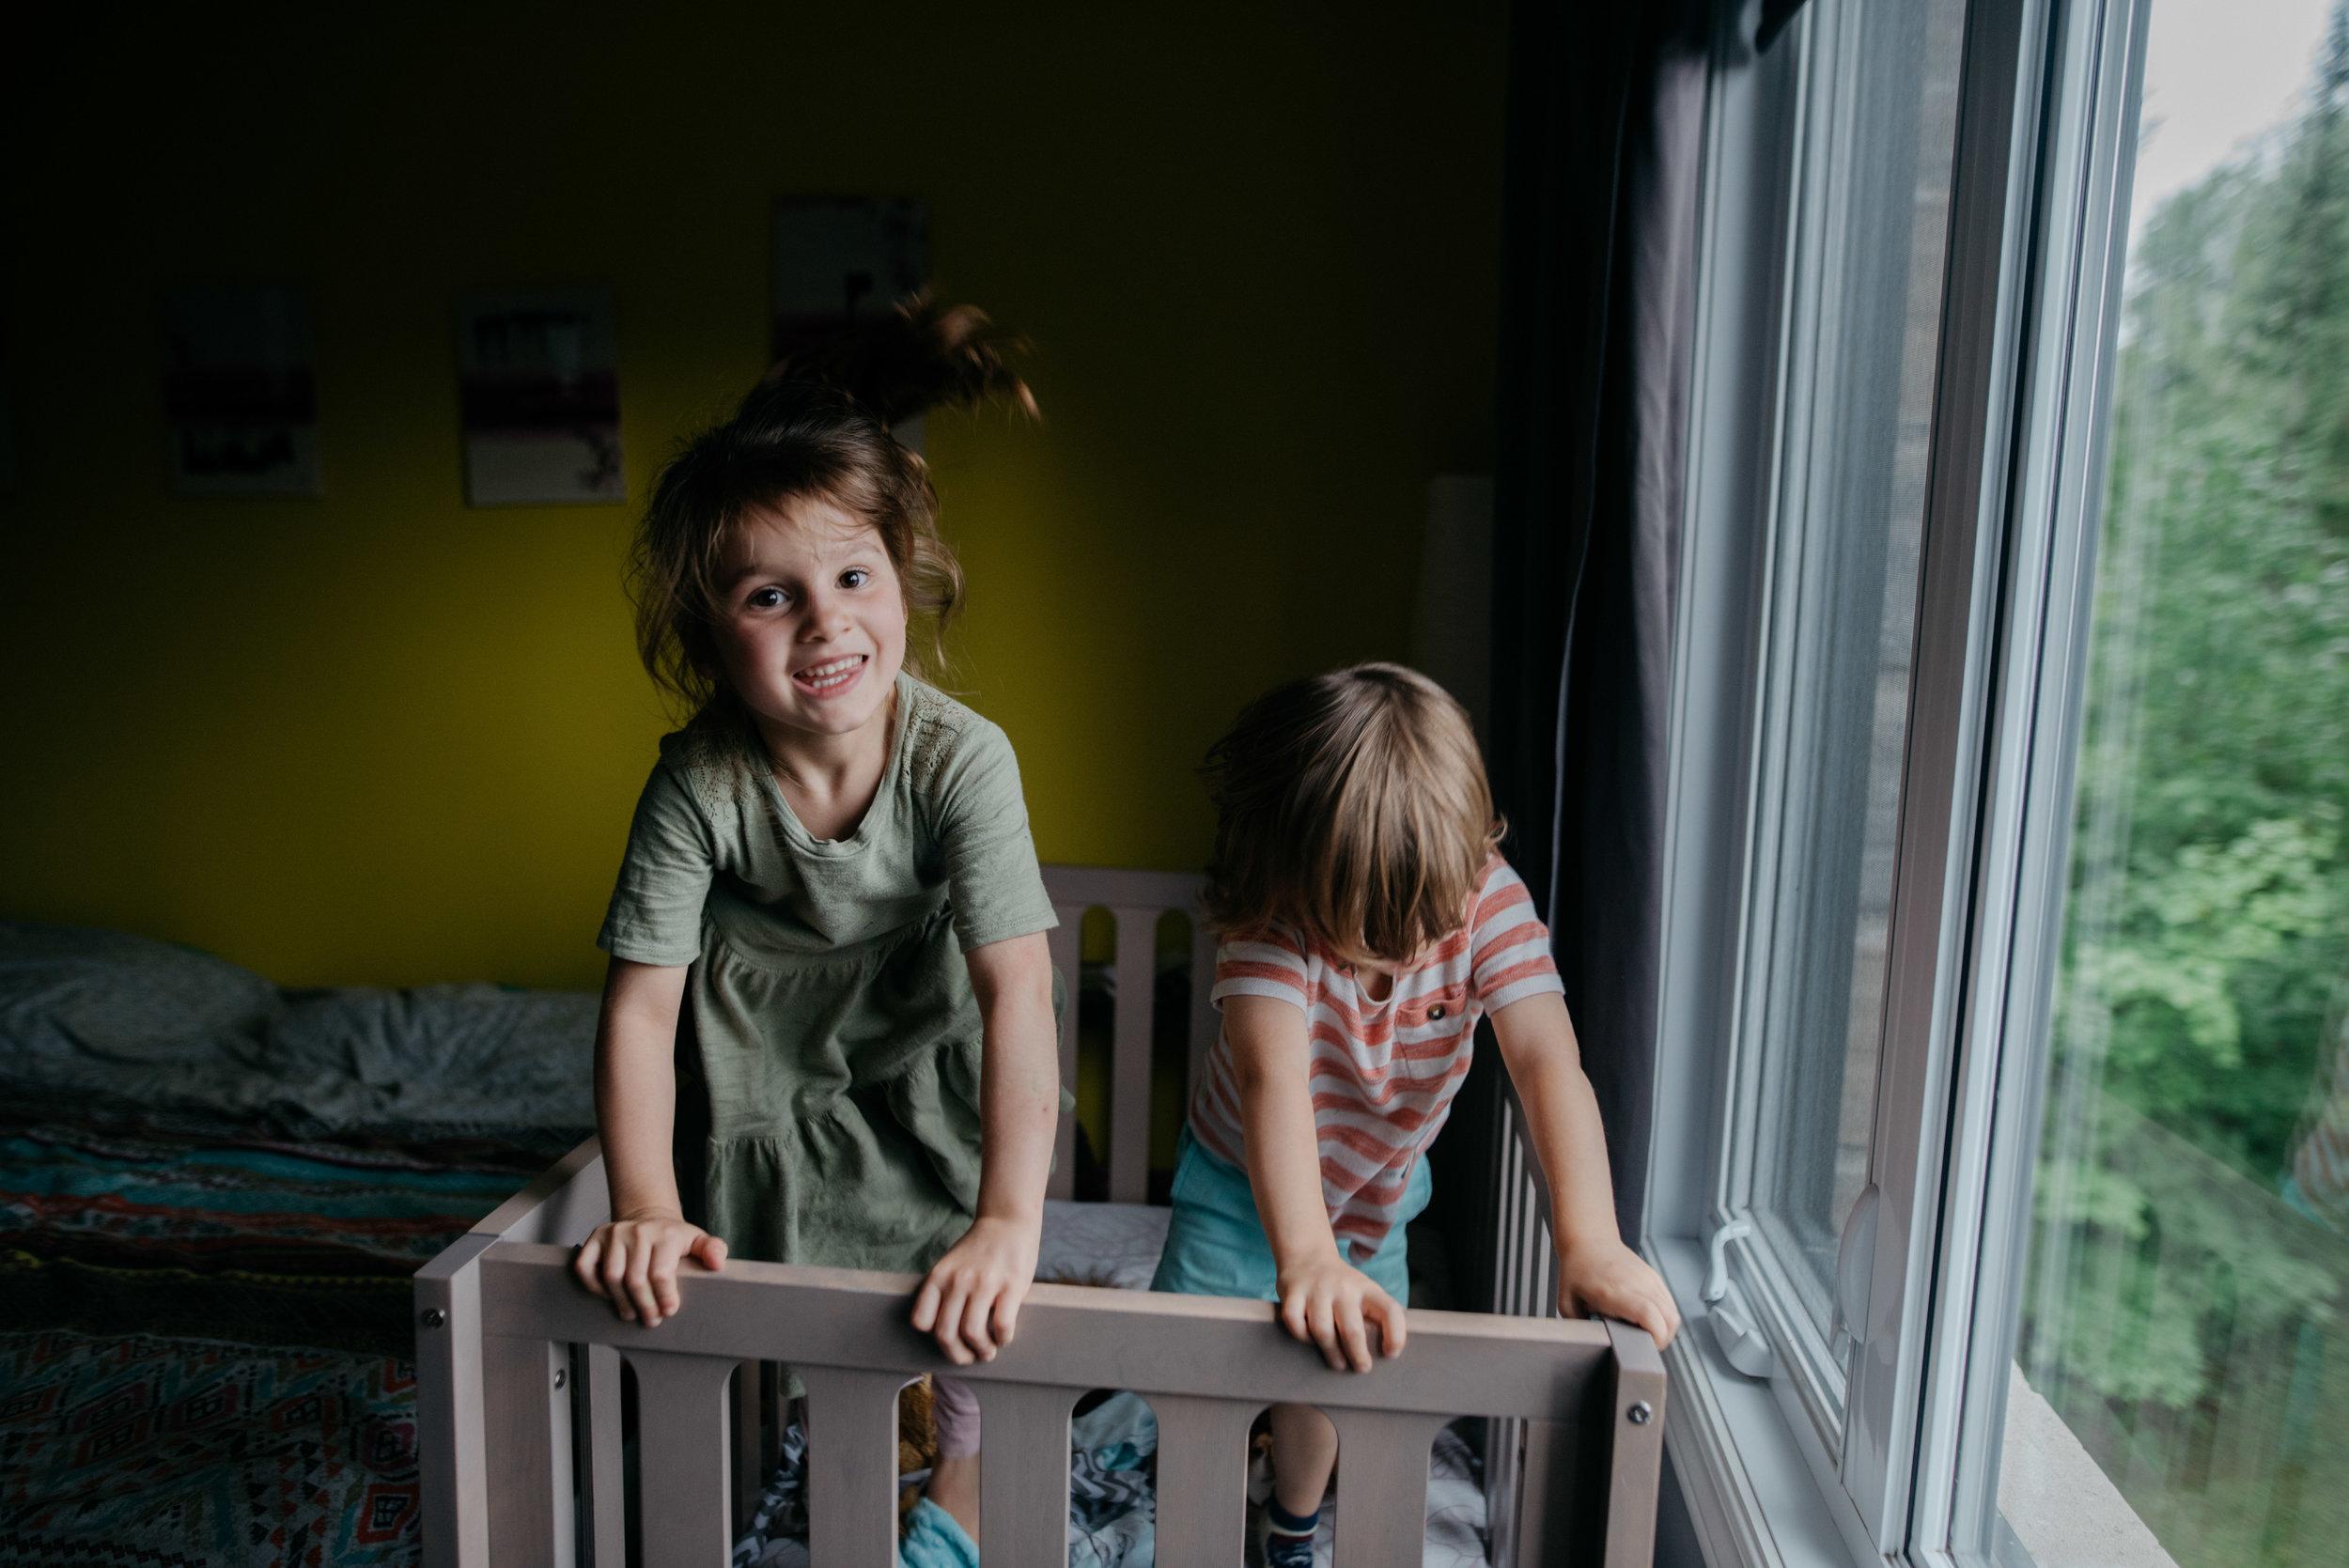 photographe_gatineau_ottawa_photographer_lifestyle_natural_candid_documentary_outaouais